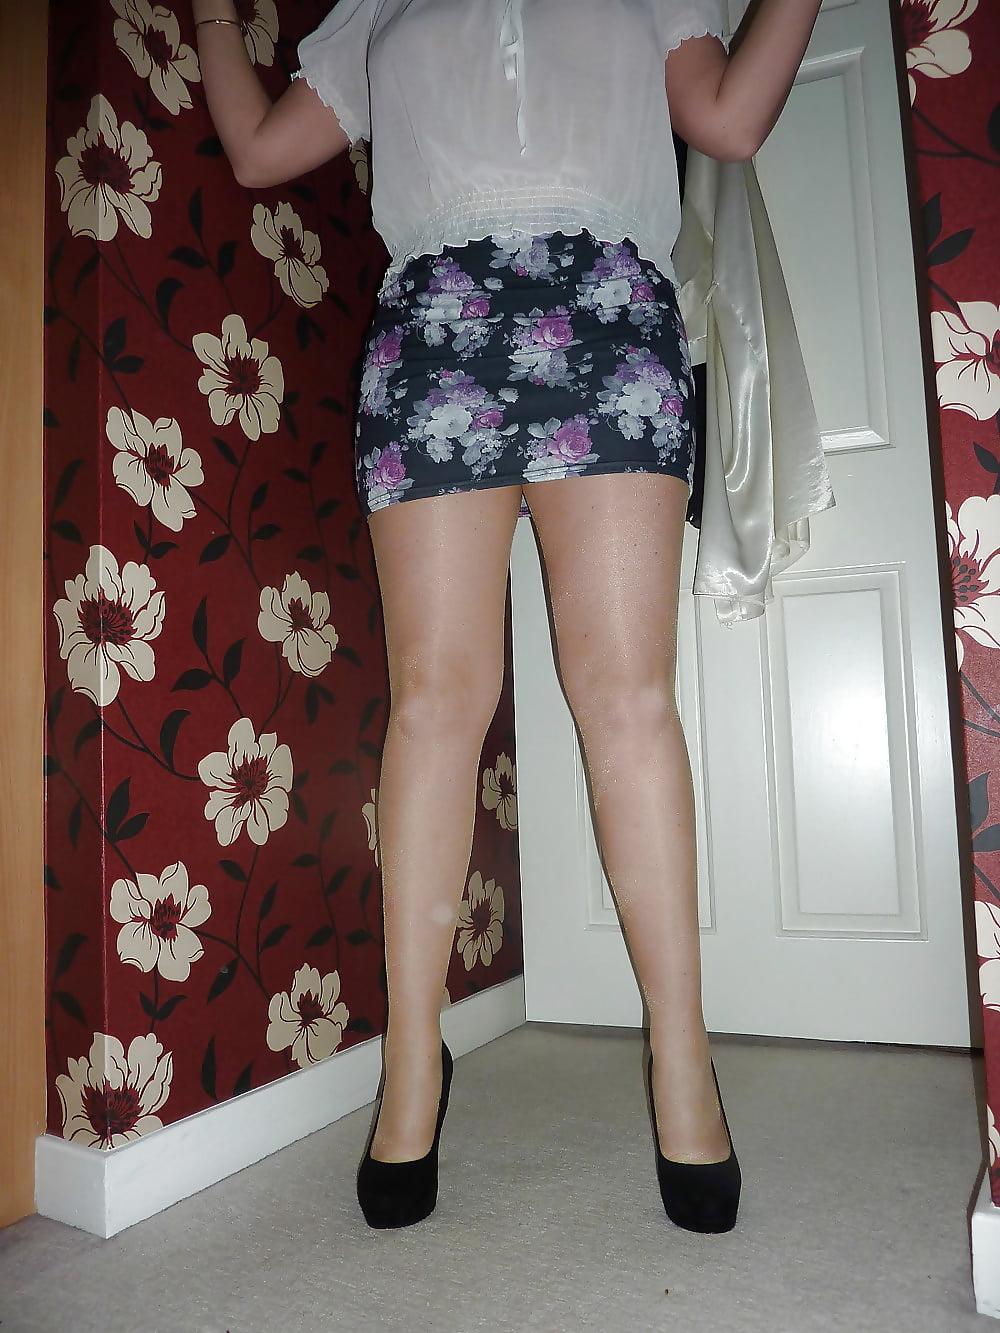 misterfake english barmaid reveals impressive tits in fake